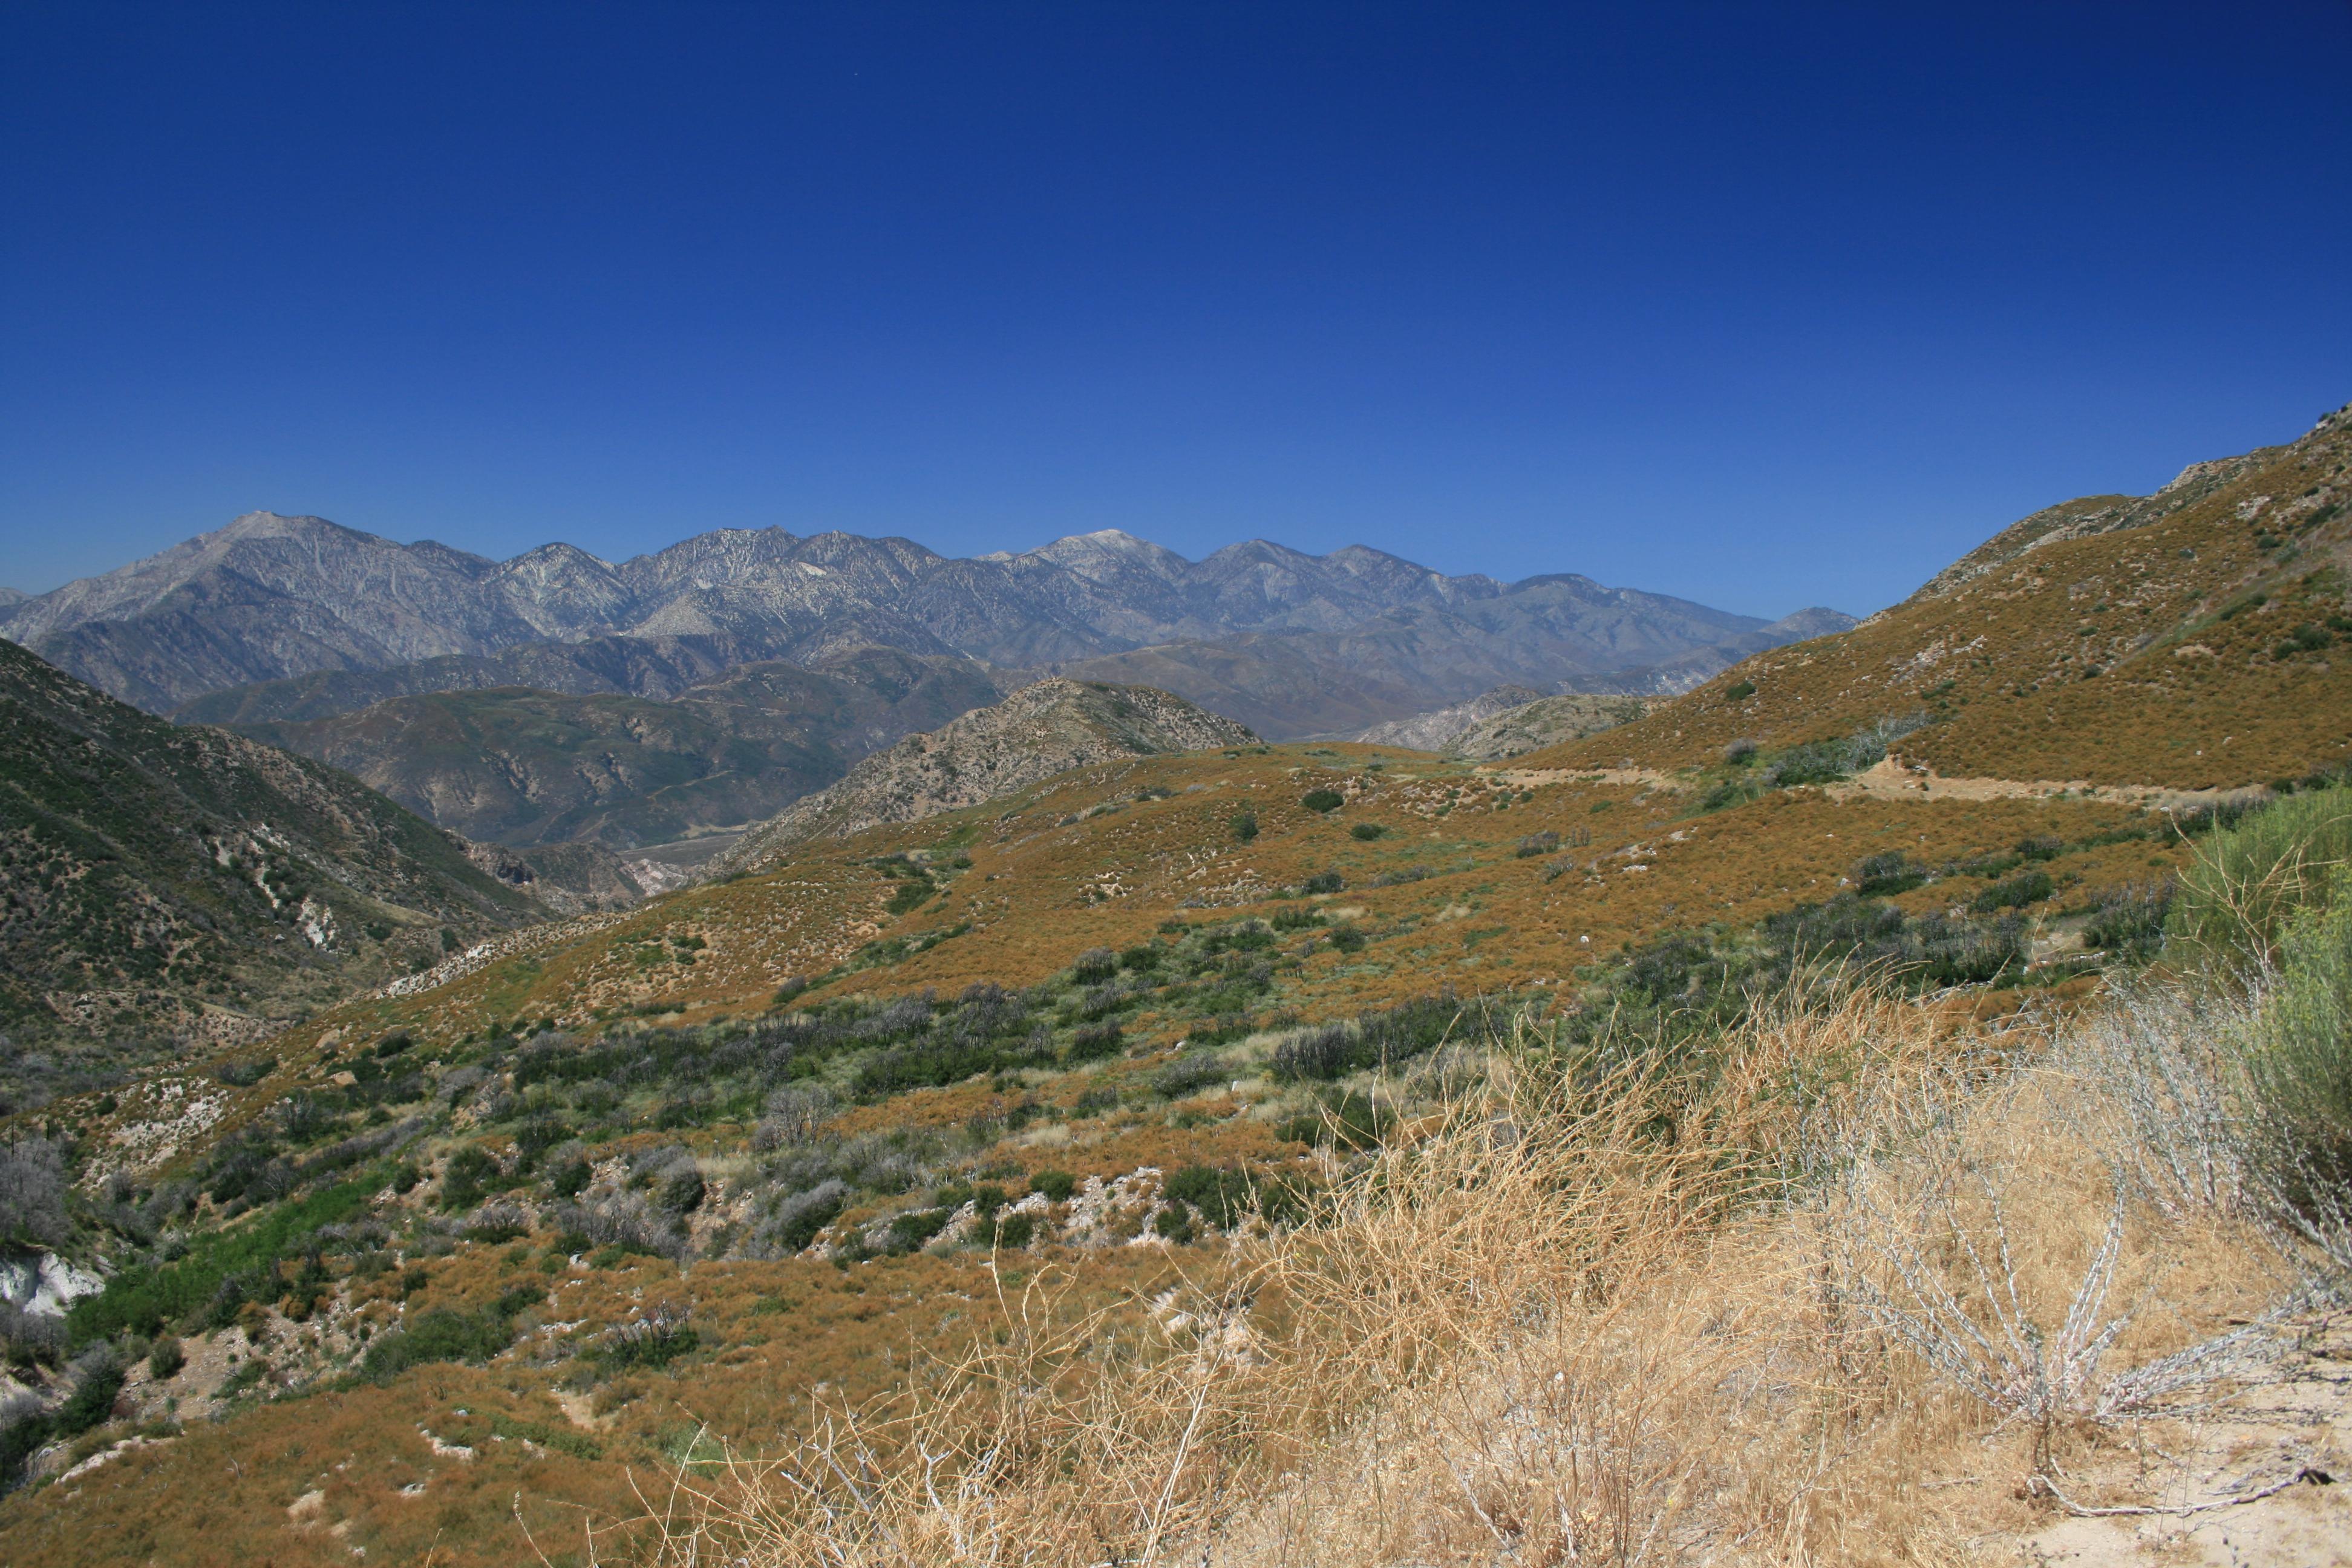 File:Mount Baldy from Silverwood lake jpg - Wikimedia Commons